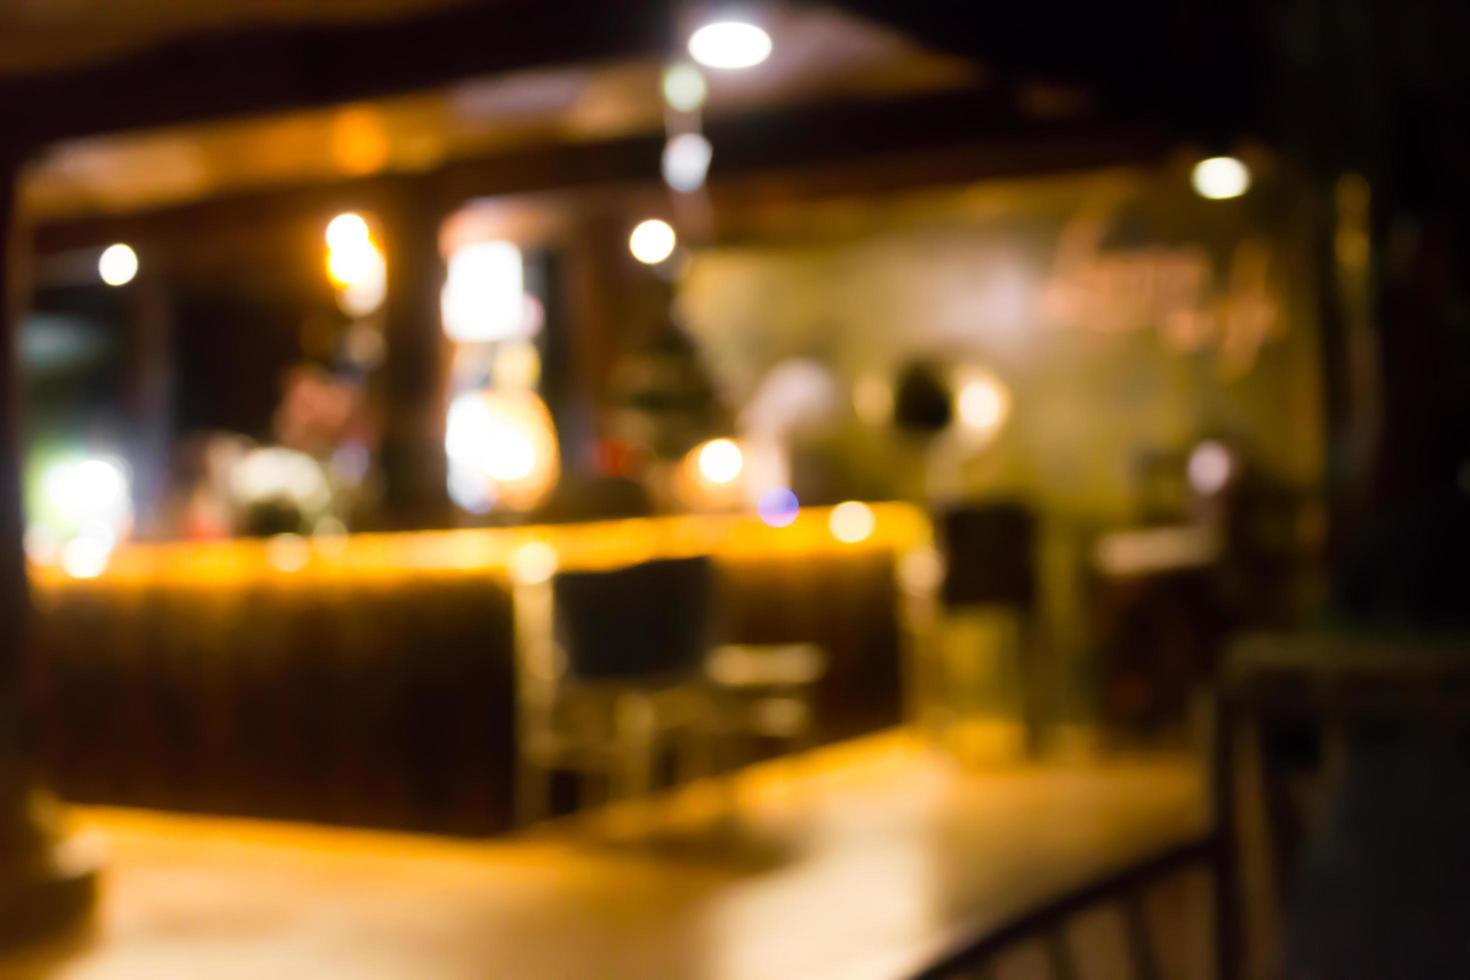 Blurred restaurant scene photo